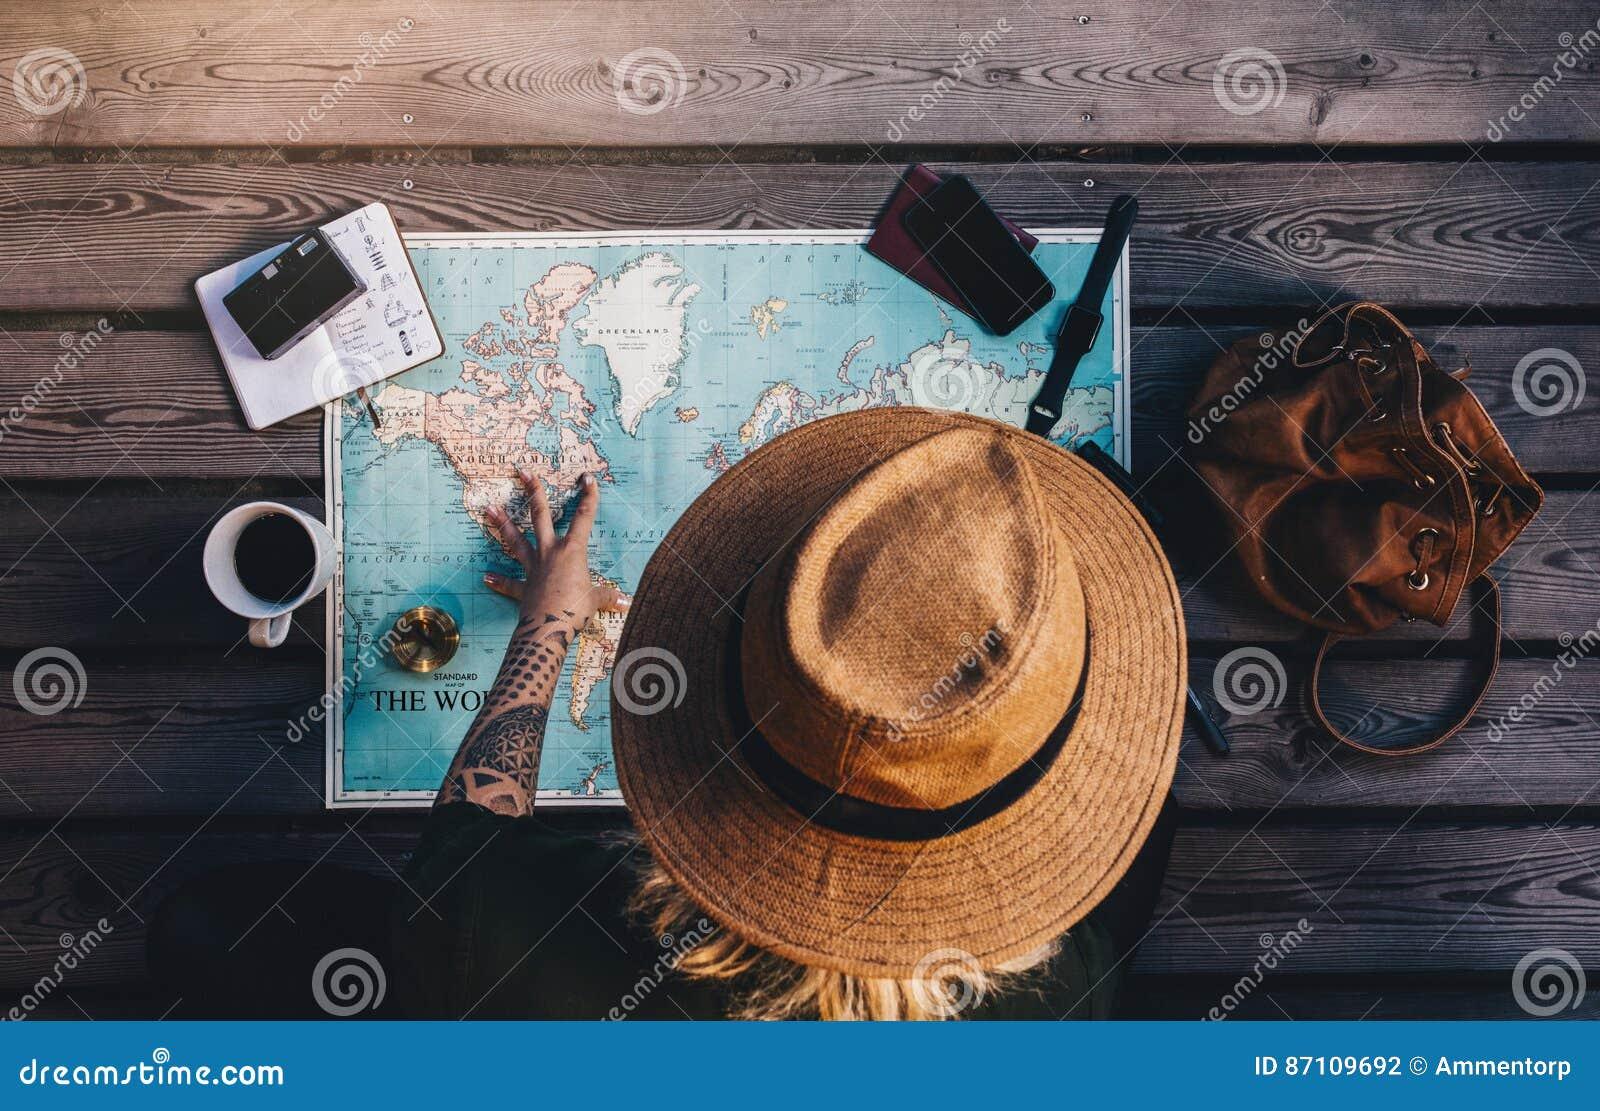 Tourist Planning vacation using world map.